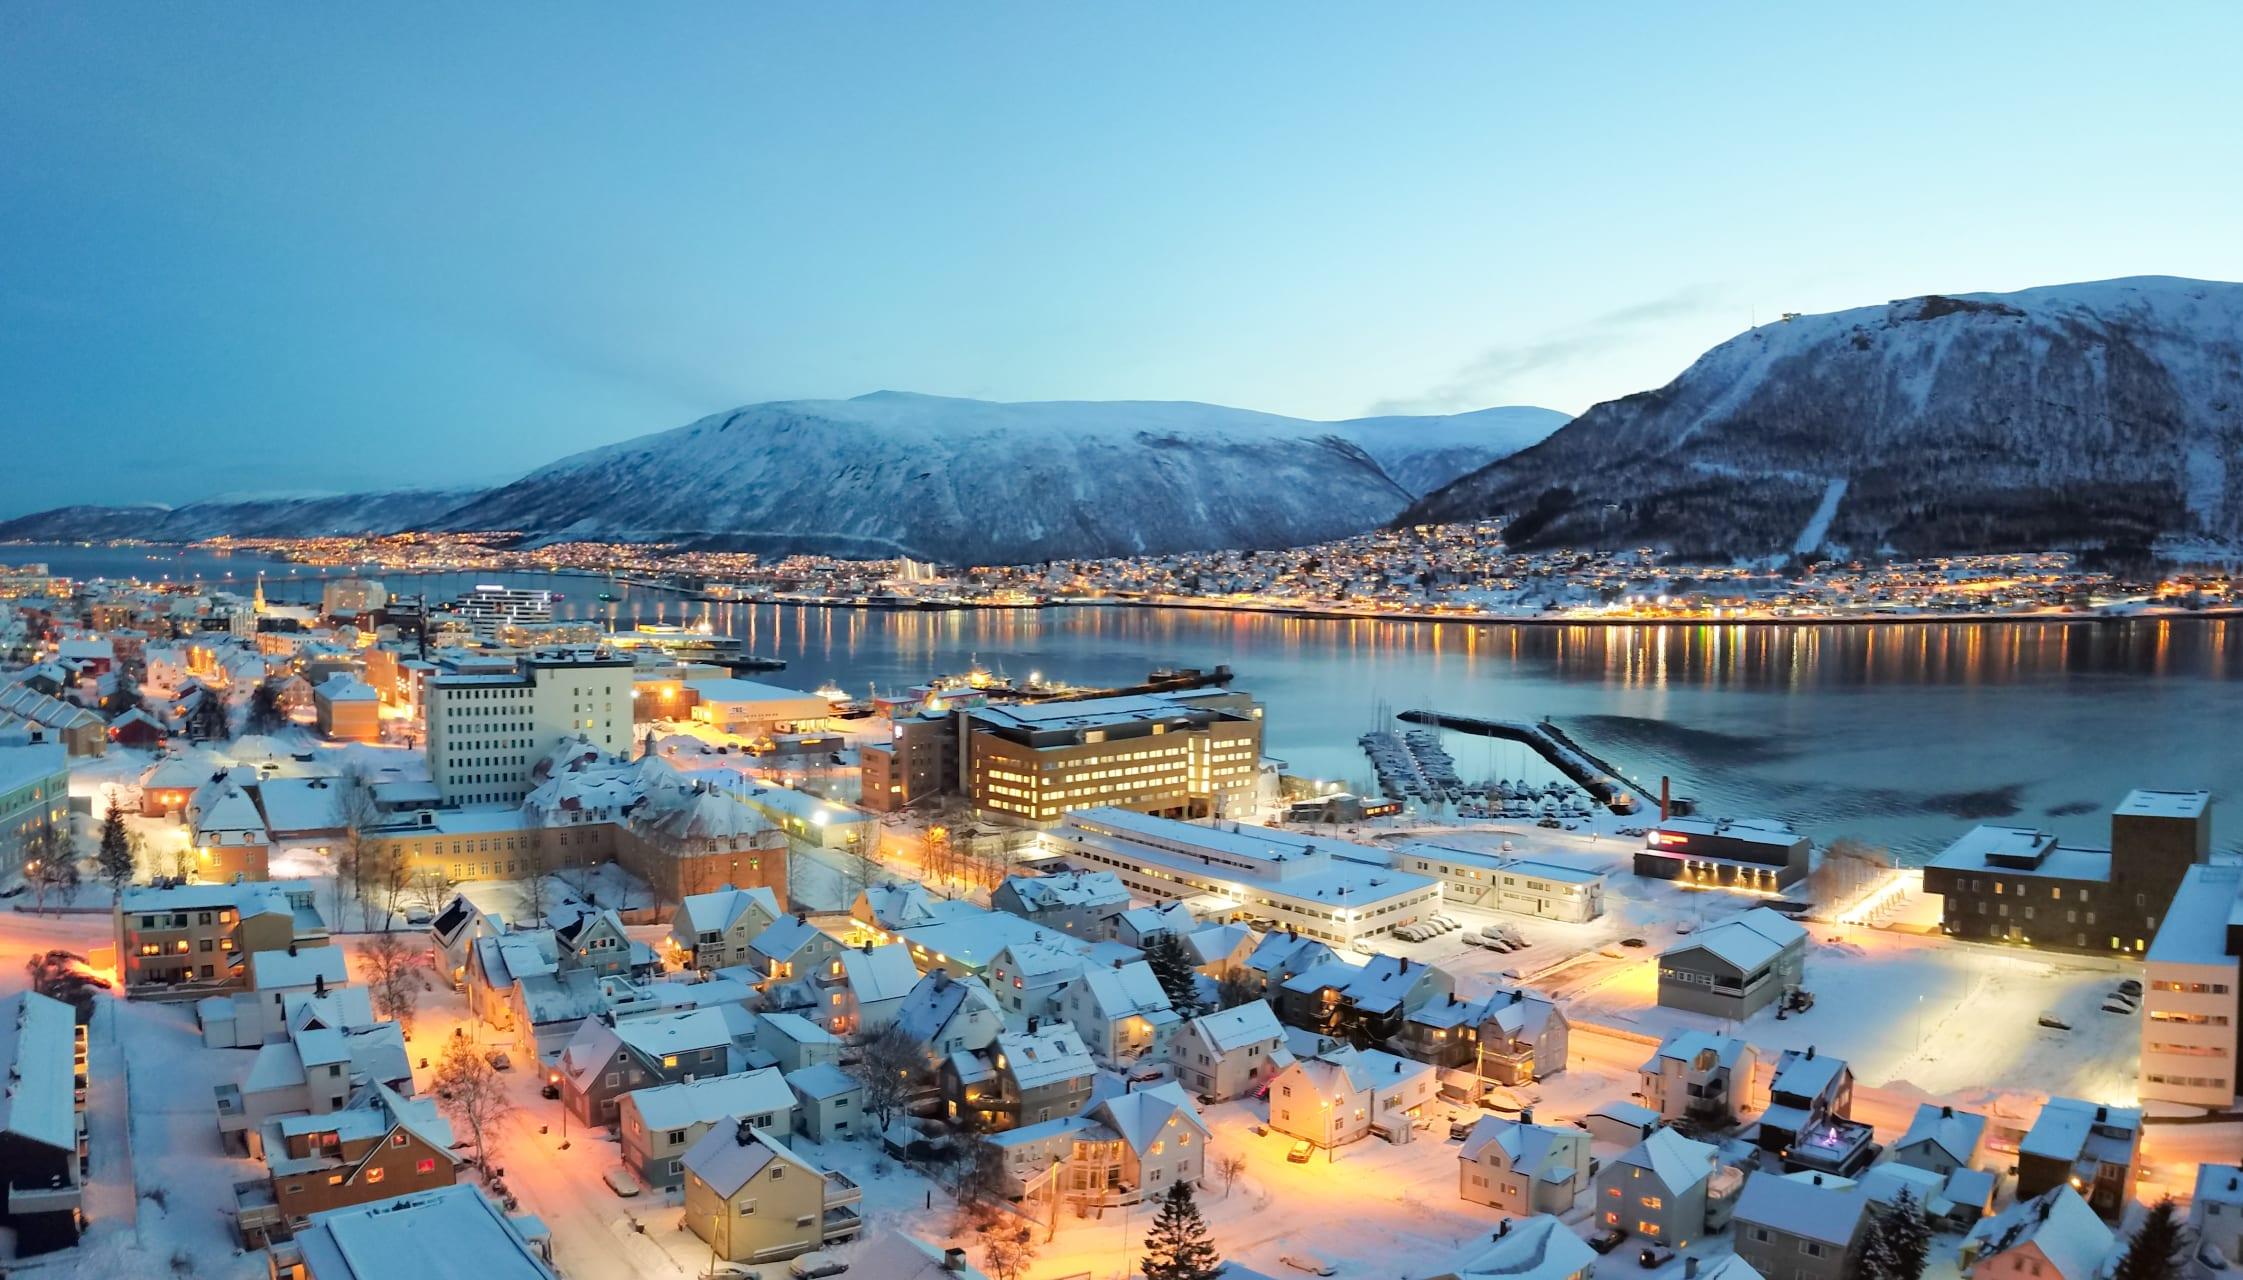 Northern Norway - Tromsø, The Paris of the North